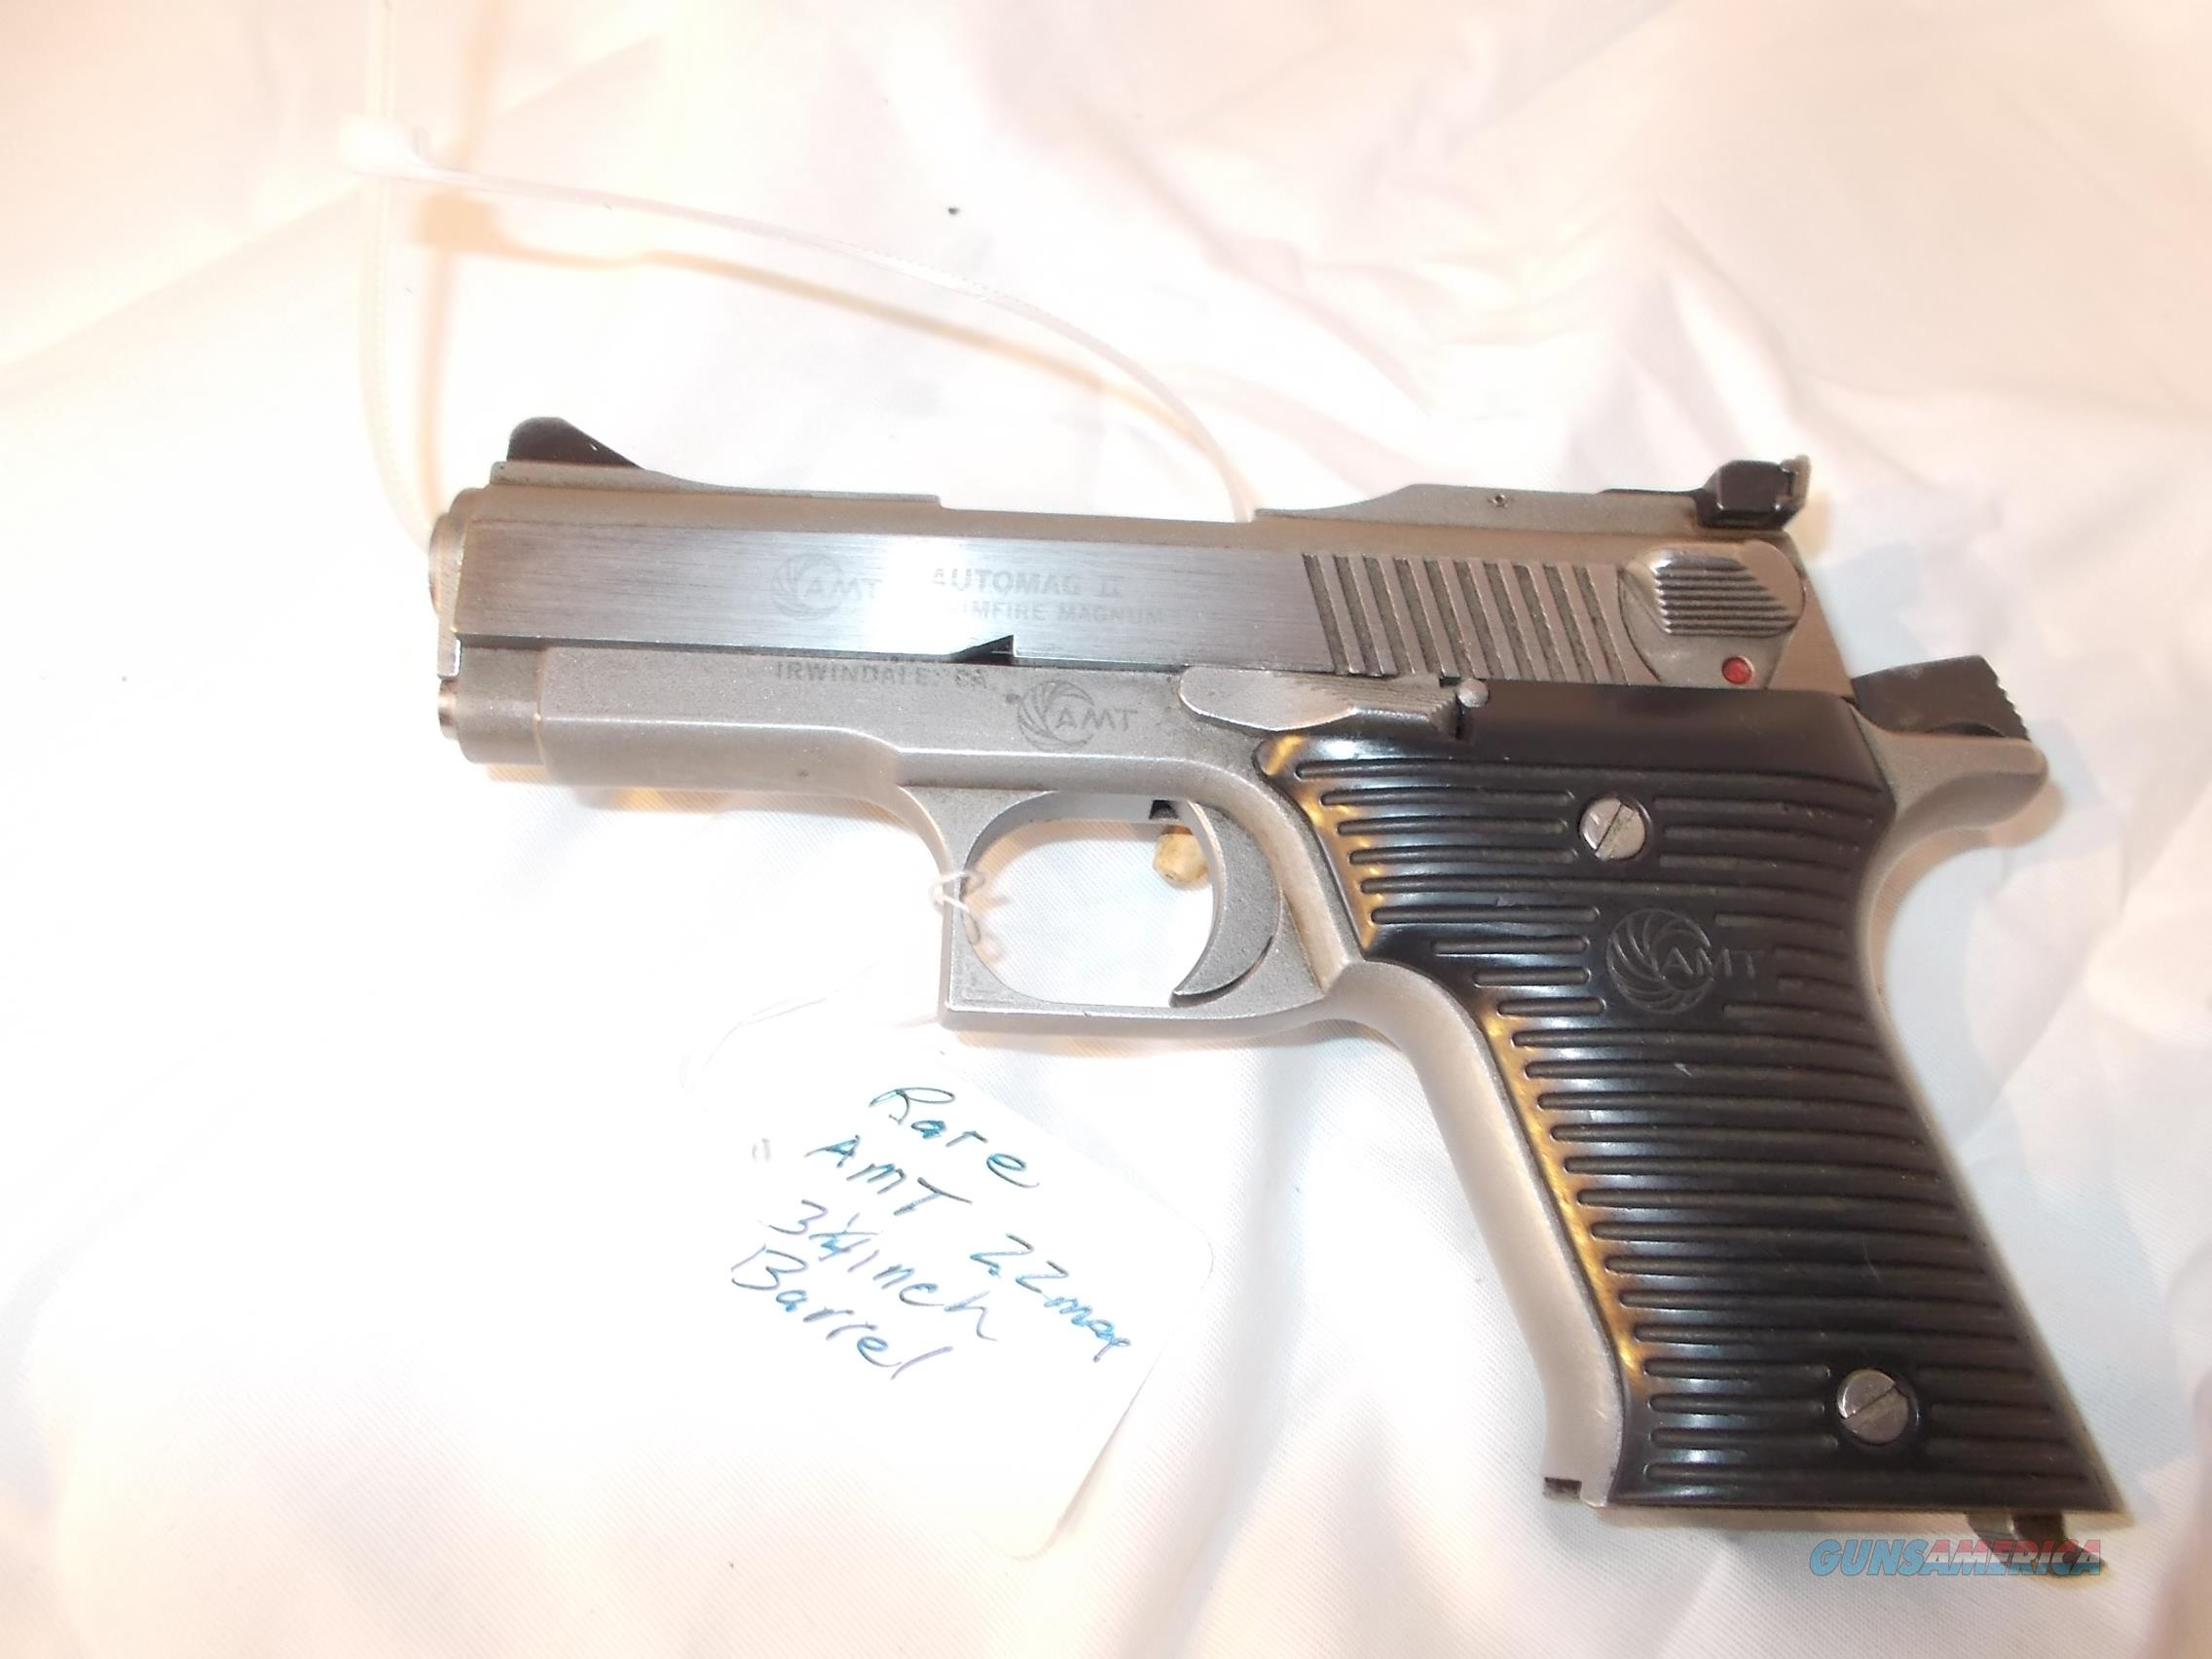 AMT automagII 22 mag 3 1/4 inch barrel very rare  Guns > Pistols > AMT Pistols > Double Action